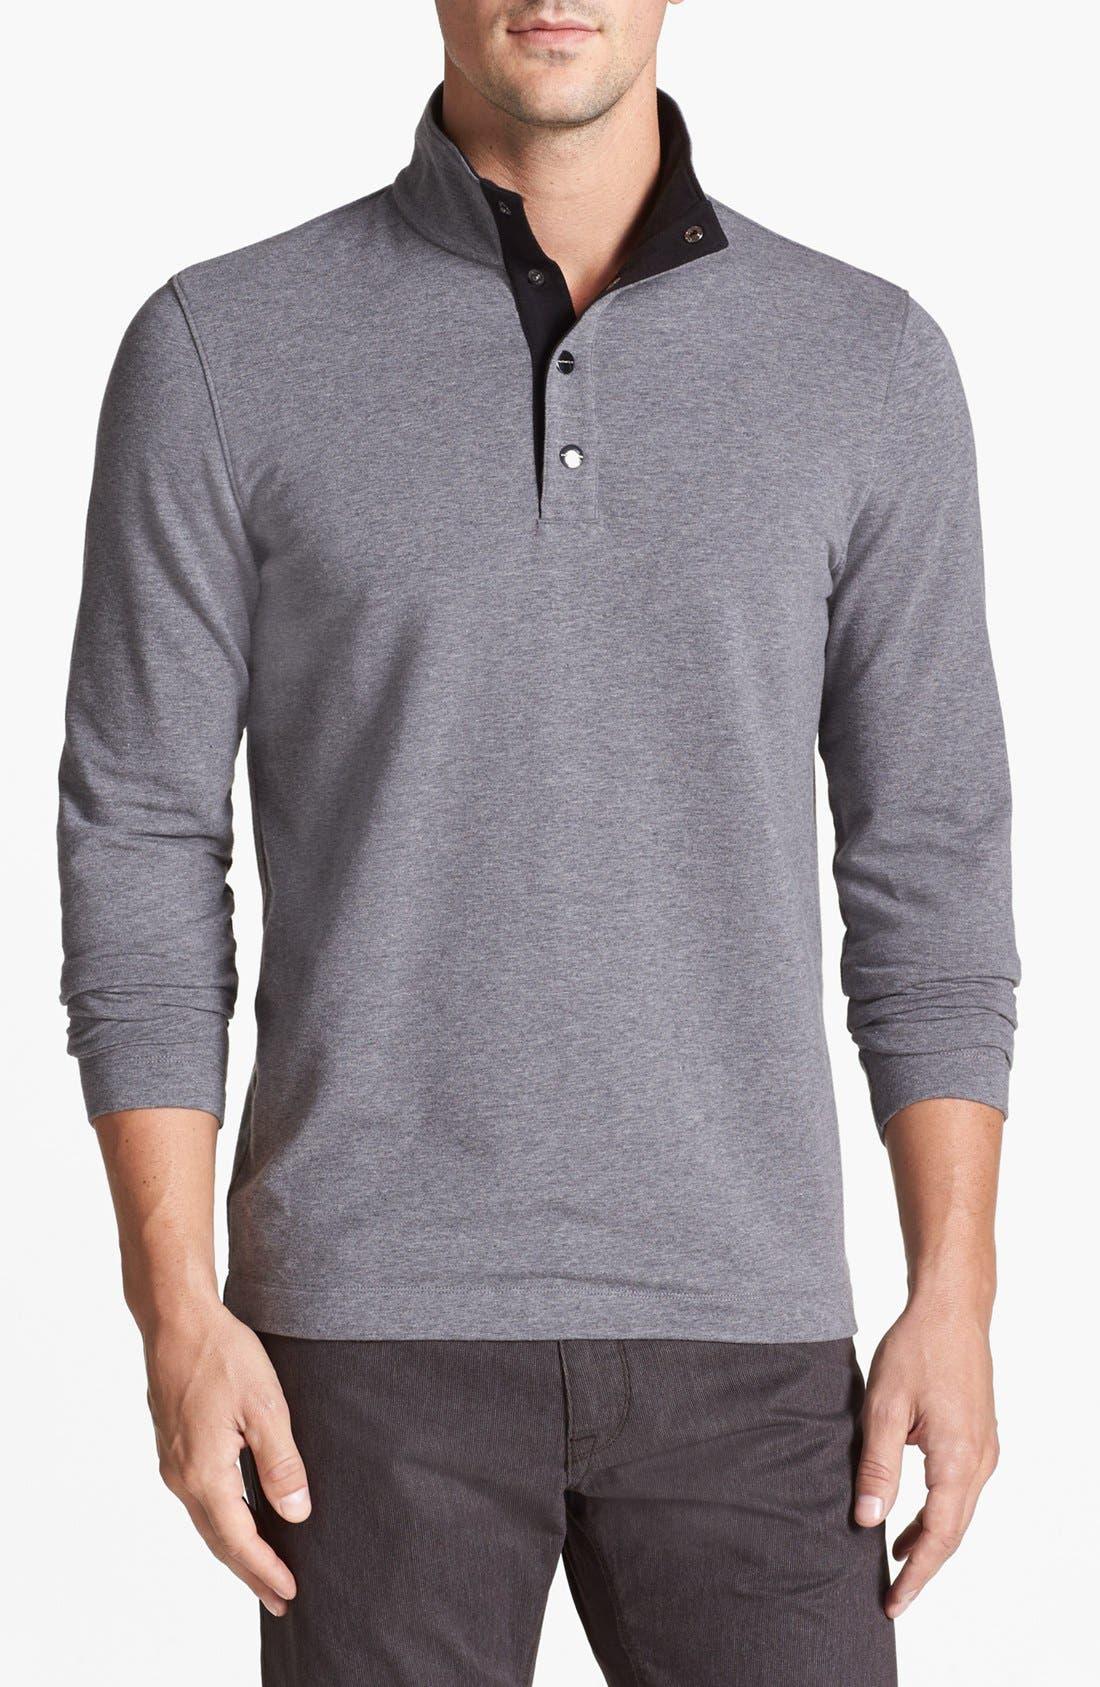 Alternate Image 1 Selected - Michael Kors Fleece Long Sleeve Top